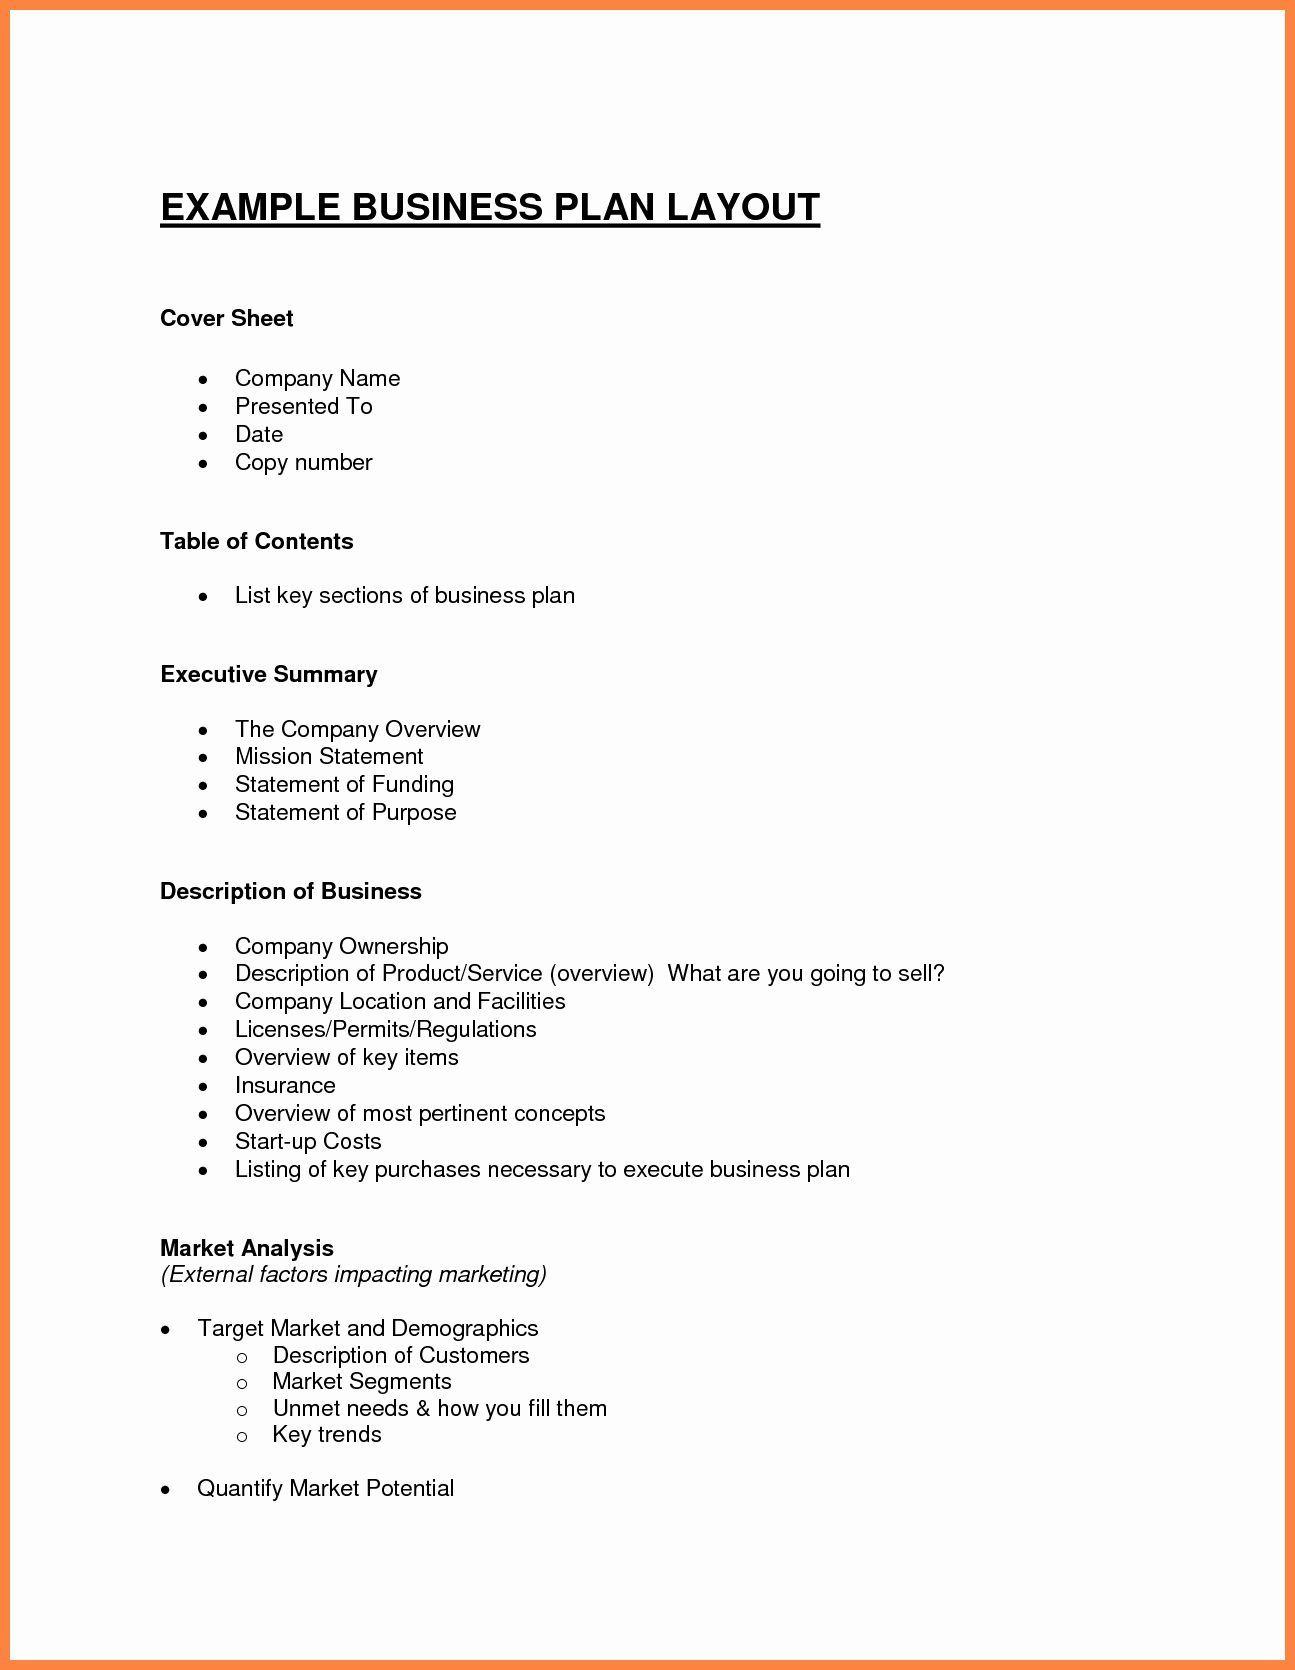 Business Plan Template Discover 40 Summary Plan Description Template Summary Plan Description Template Inspirational Busin In 2020 Geschaftsplane Planer Cover The Plan